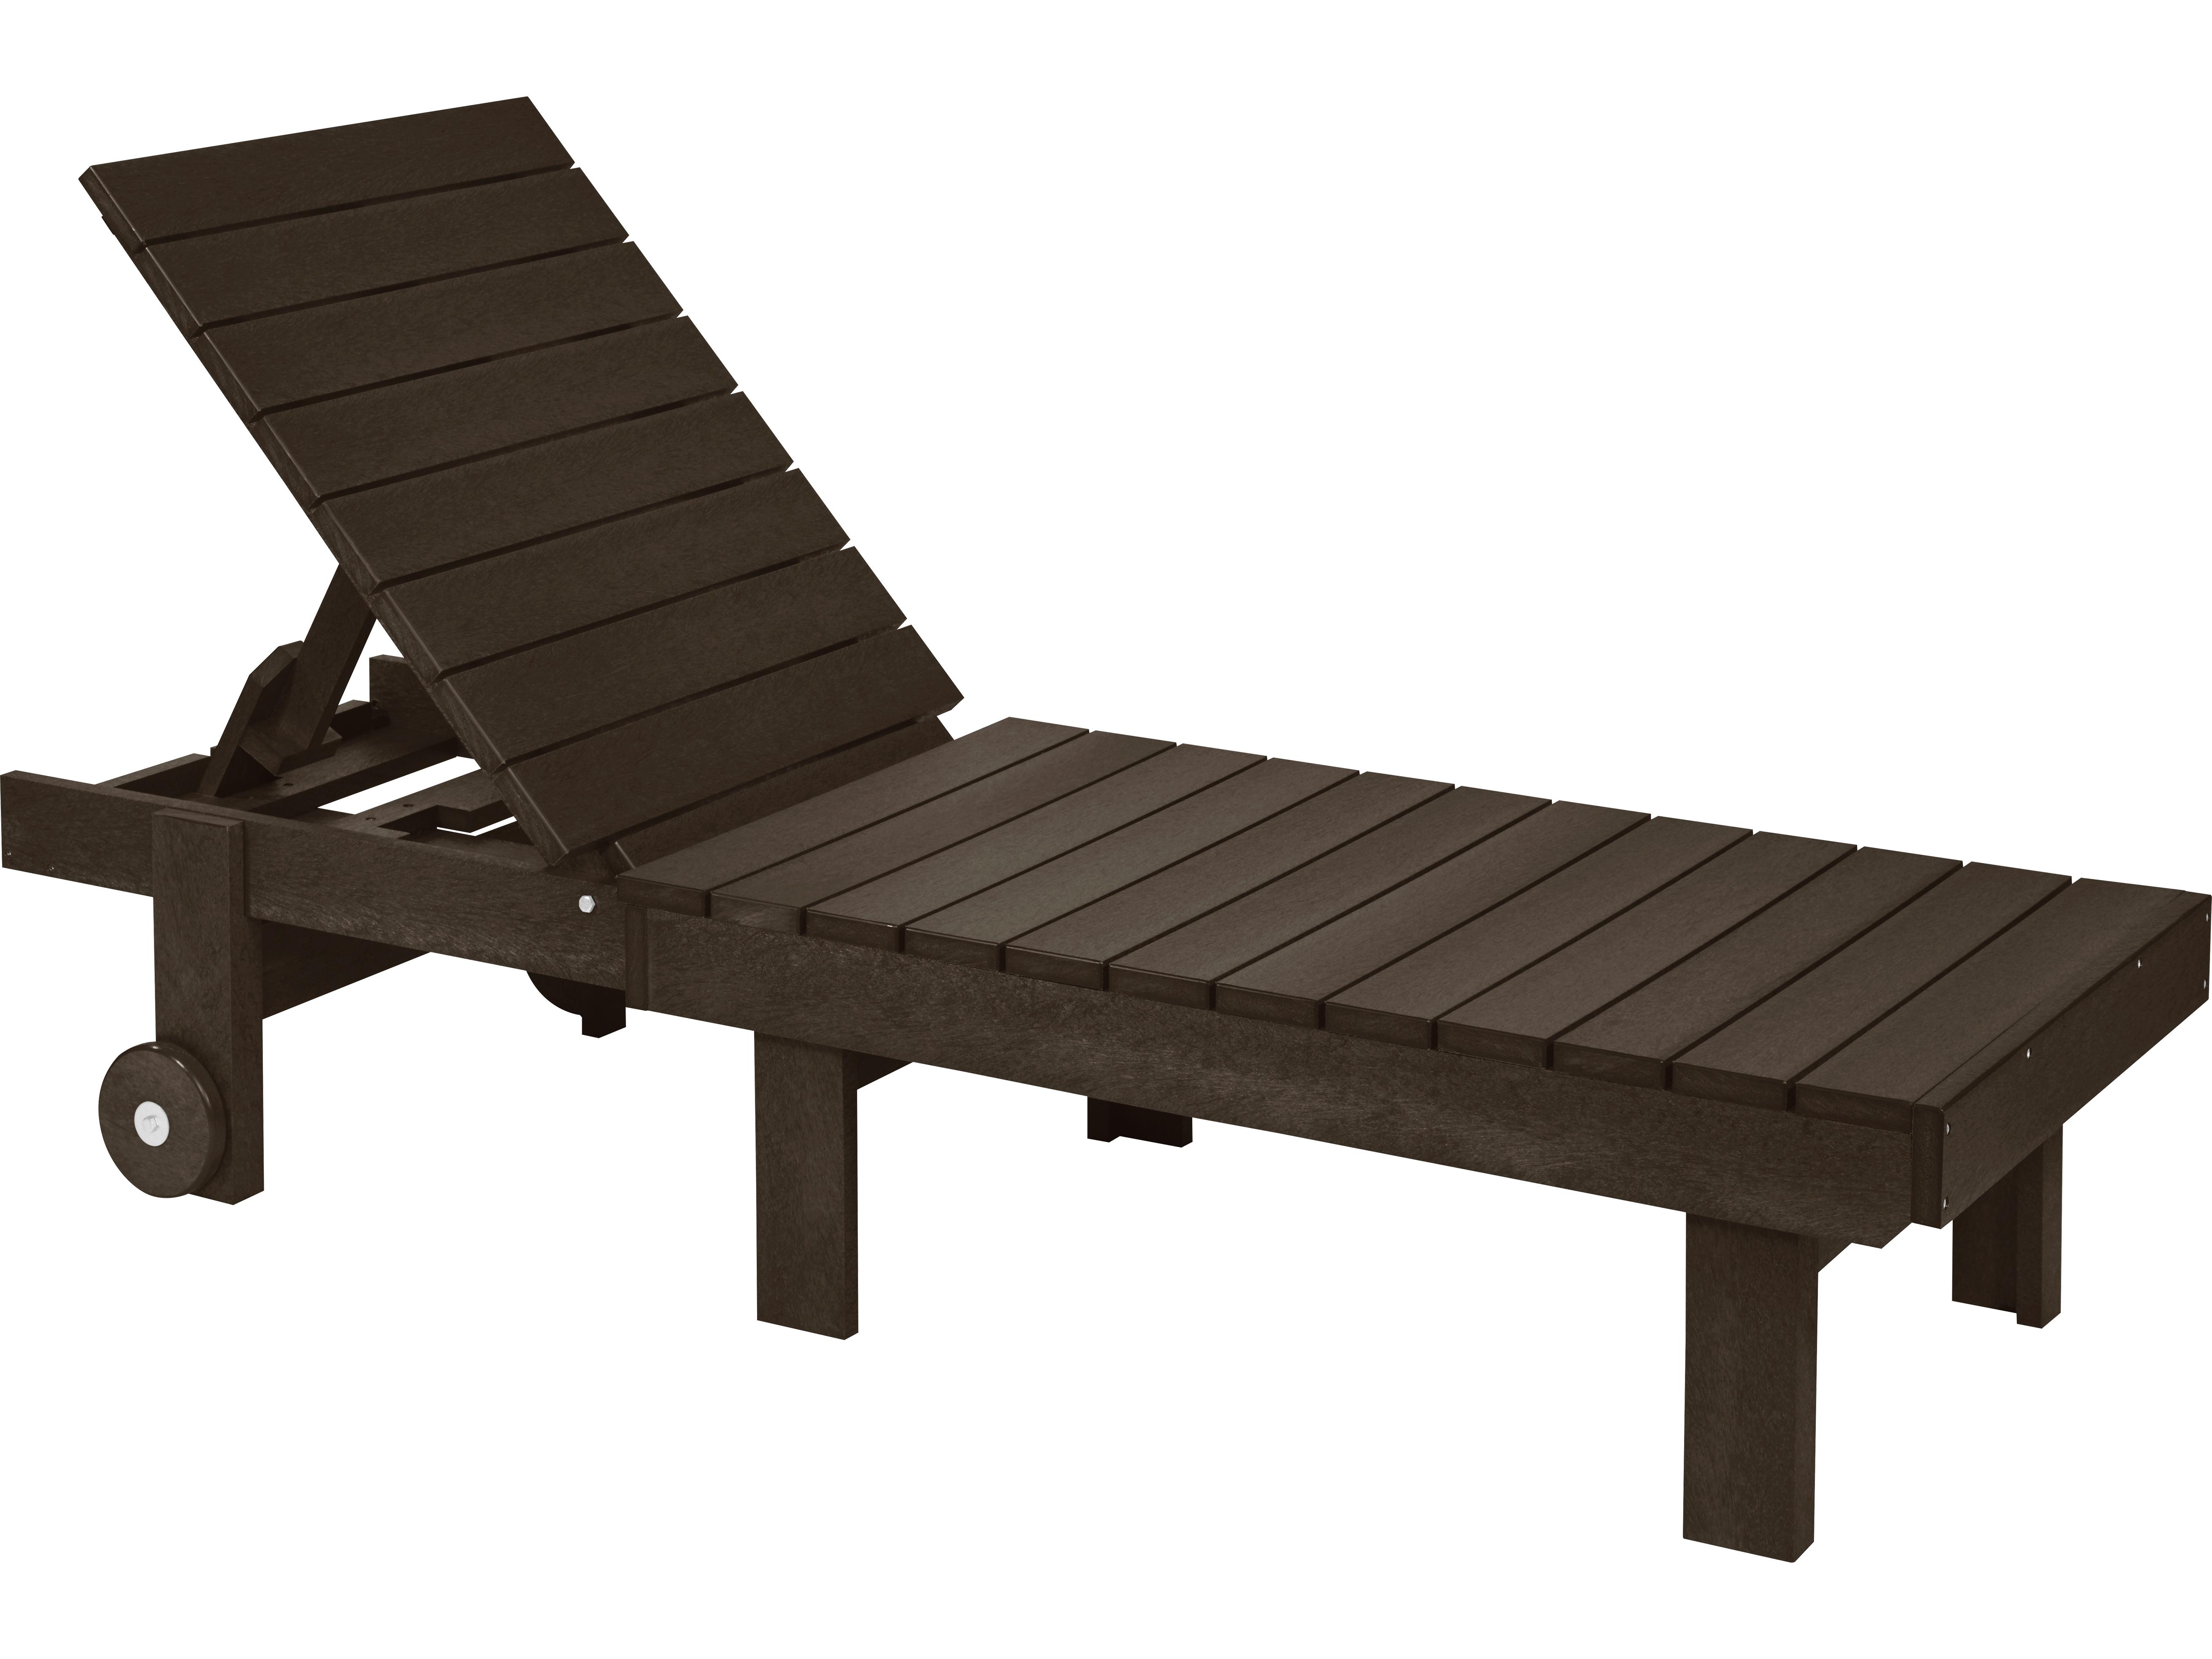 luxe bain de soleil zublena id es de bain de soleil. Black Bedroom Furniture Sets. Home Design Ideas